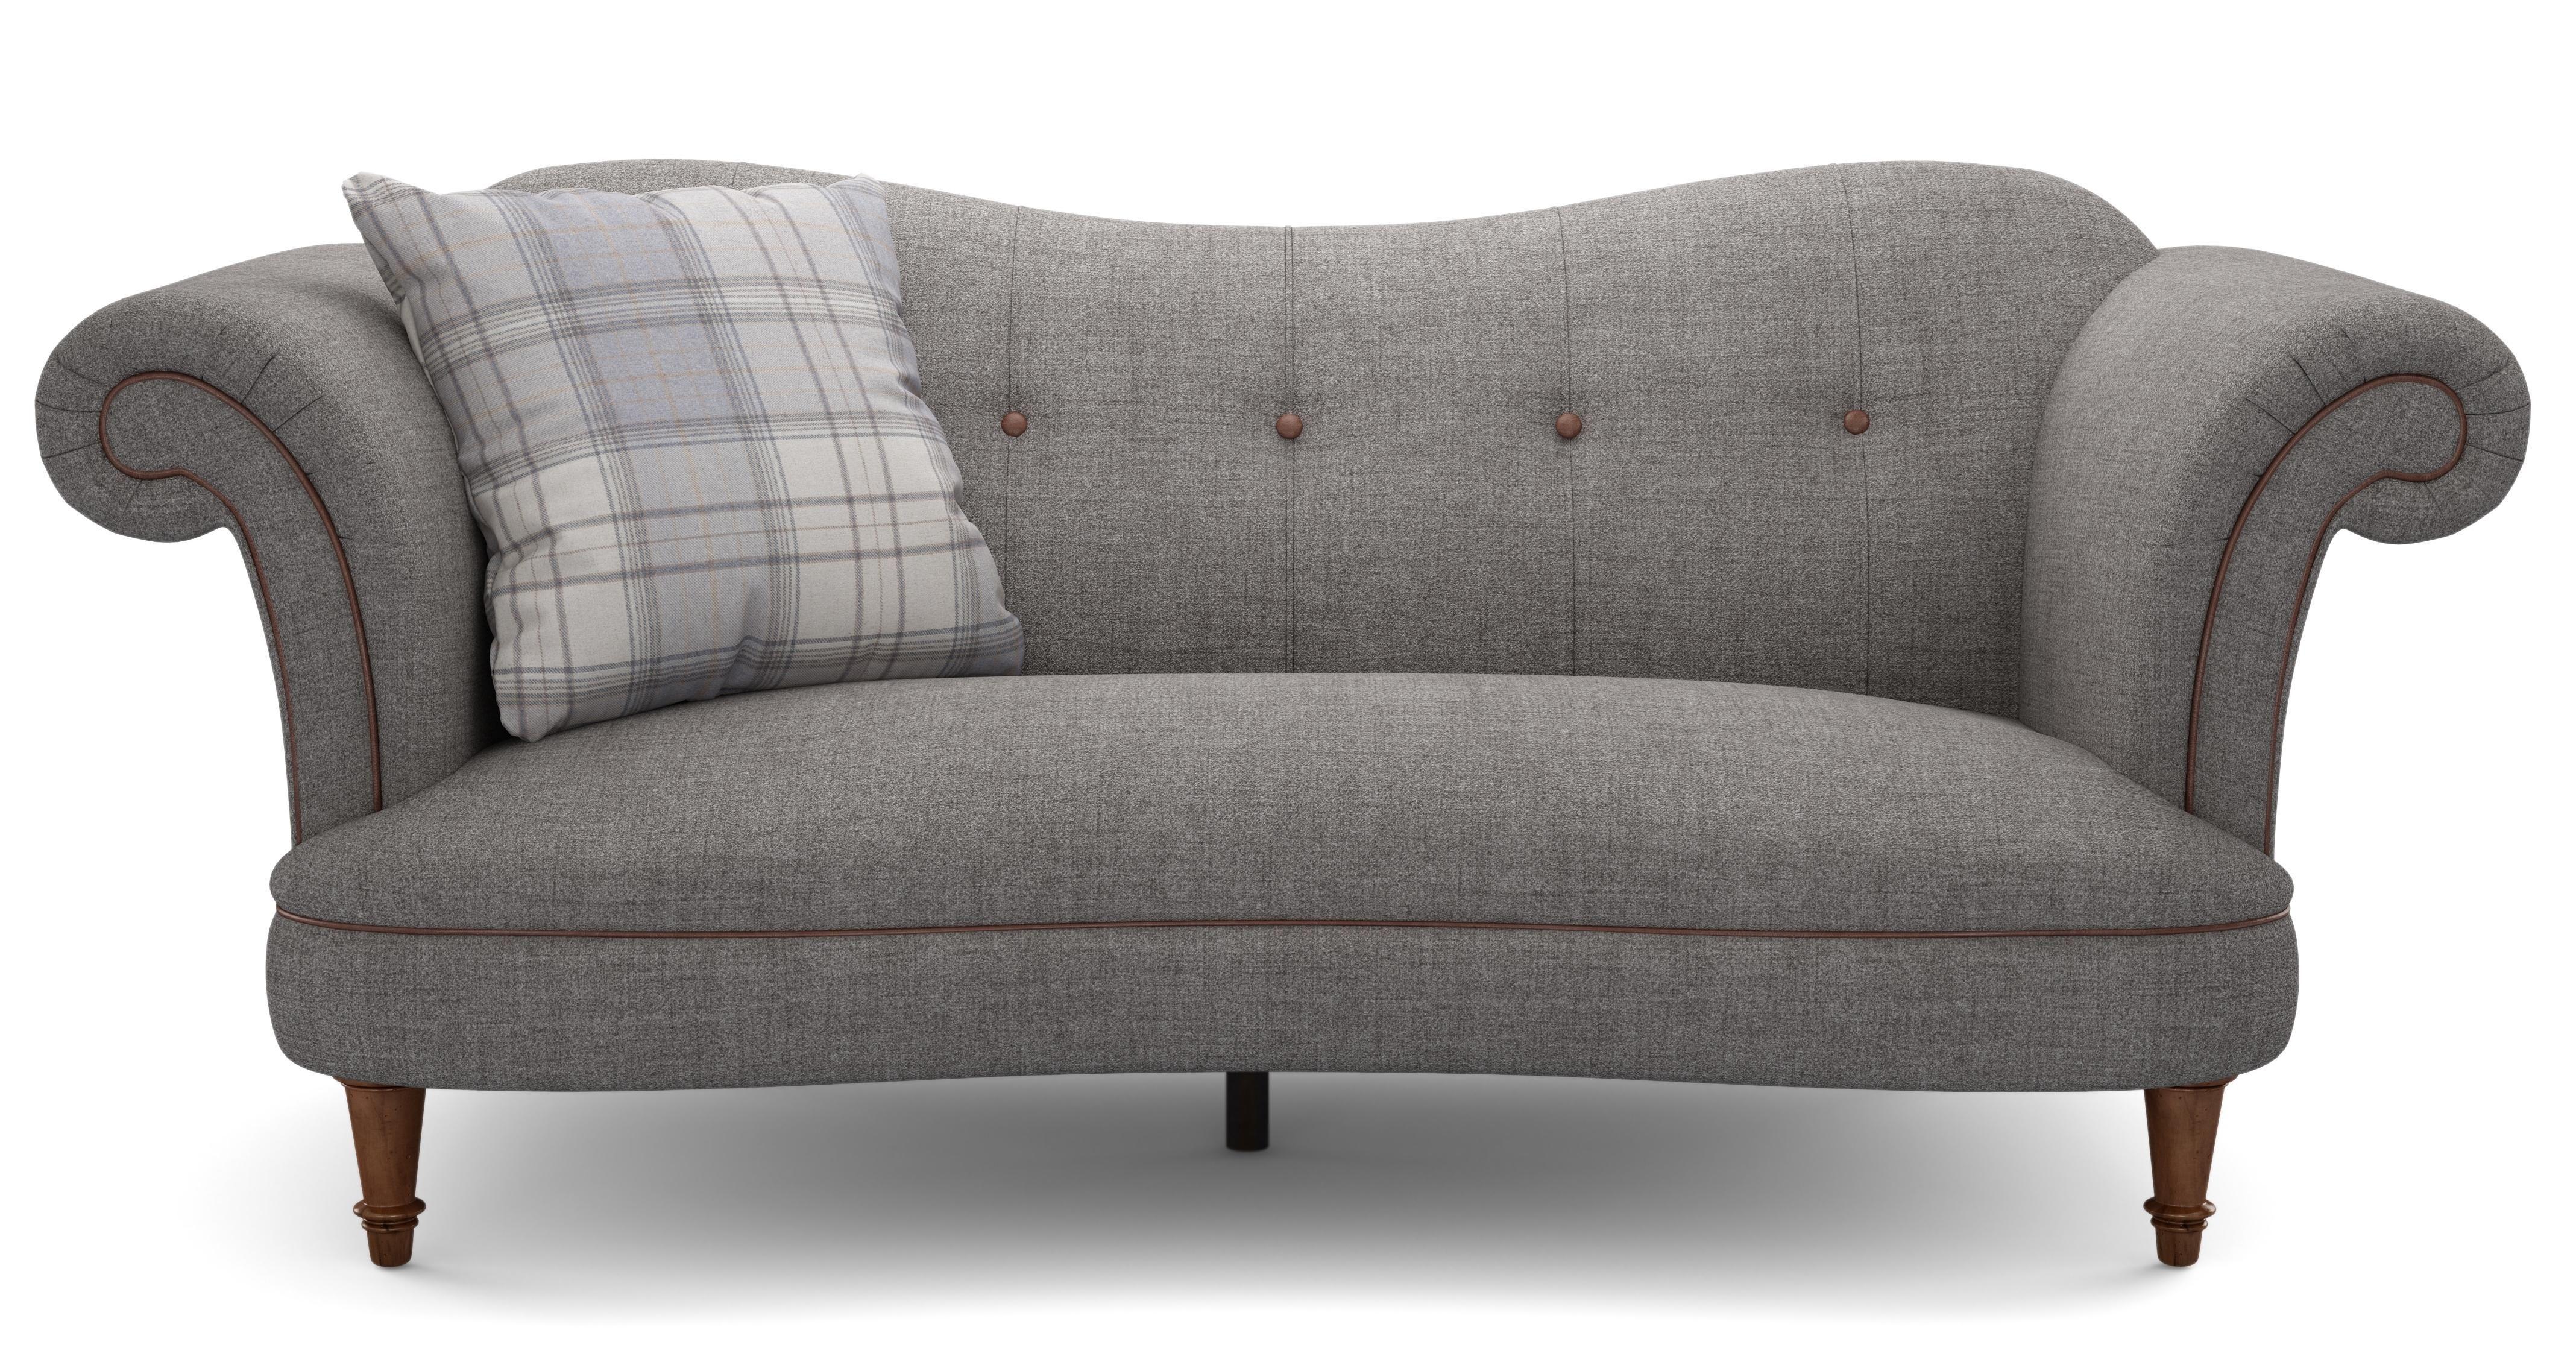 DFS 2 Seater Sofa Moray 2 seater sofa, Sofa, 3 seater sofa